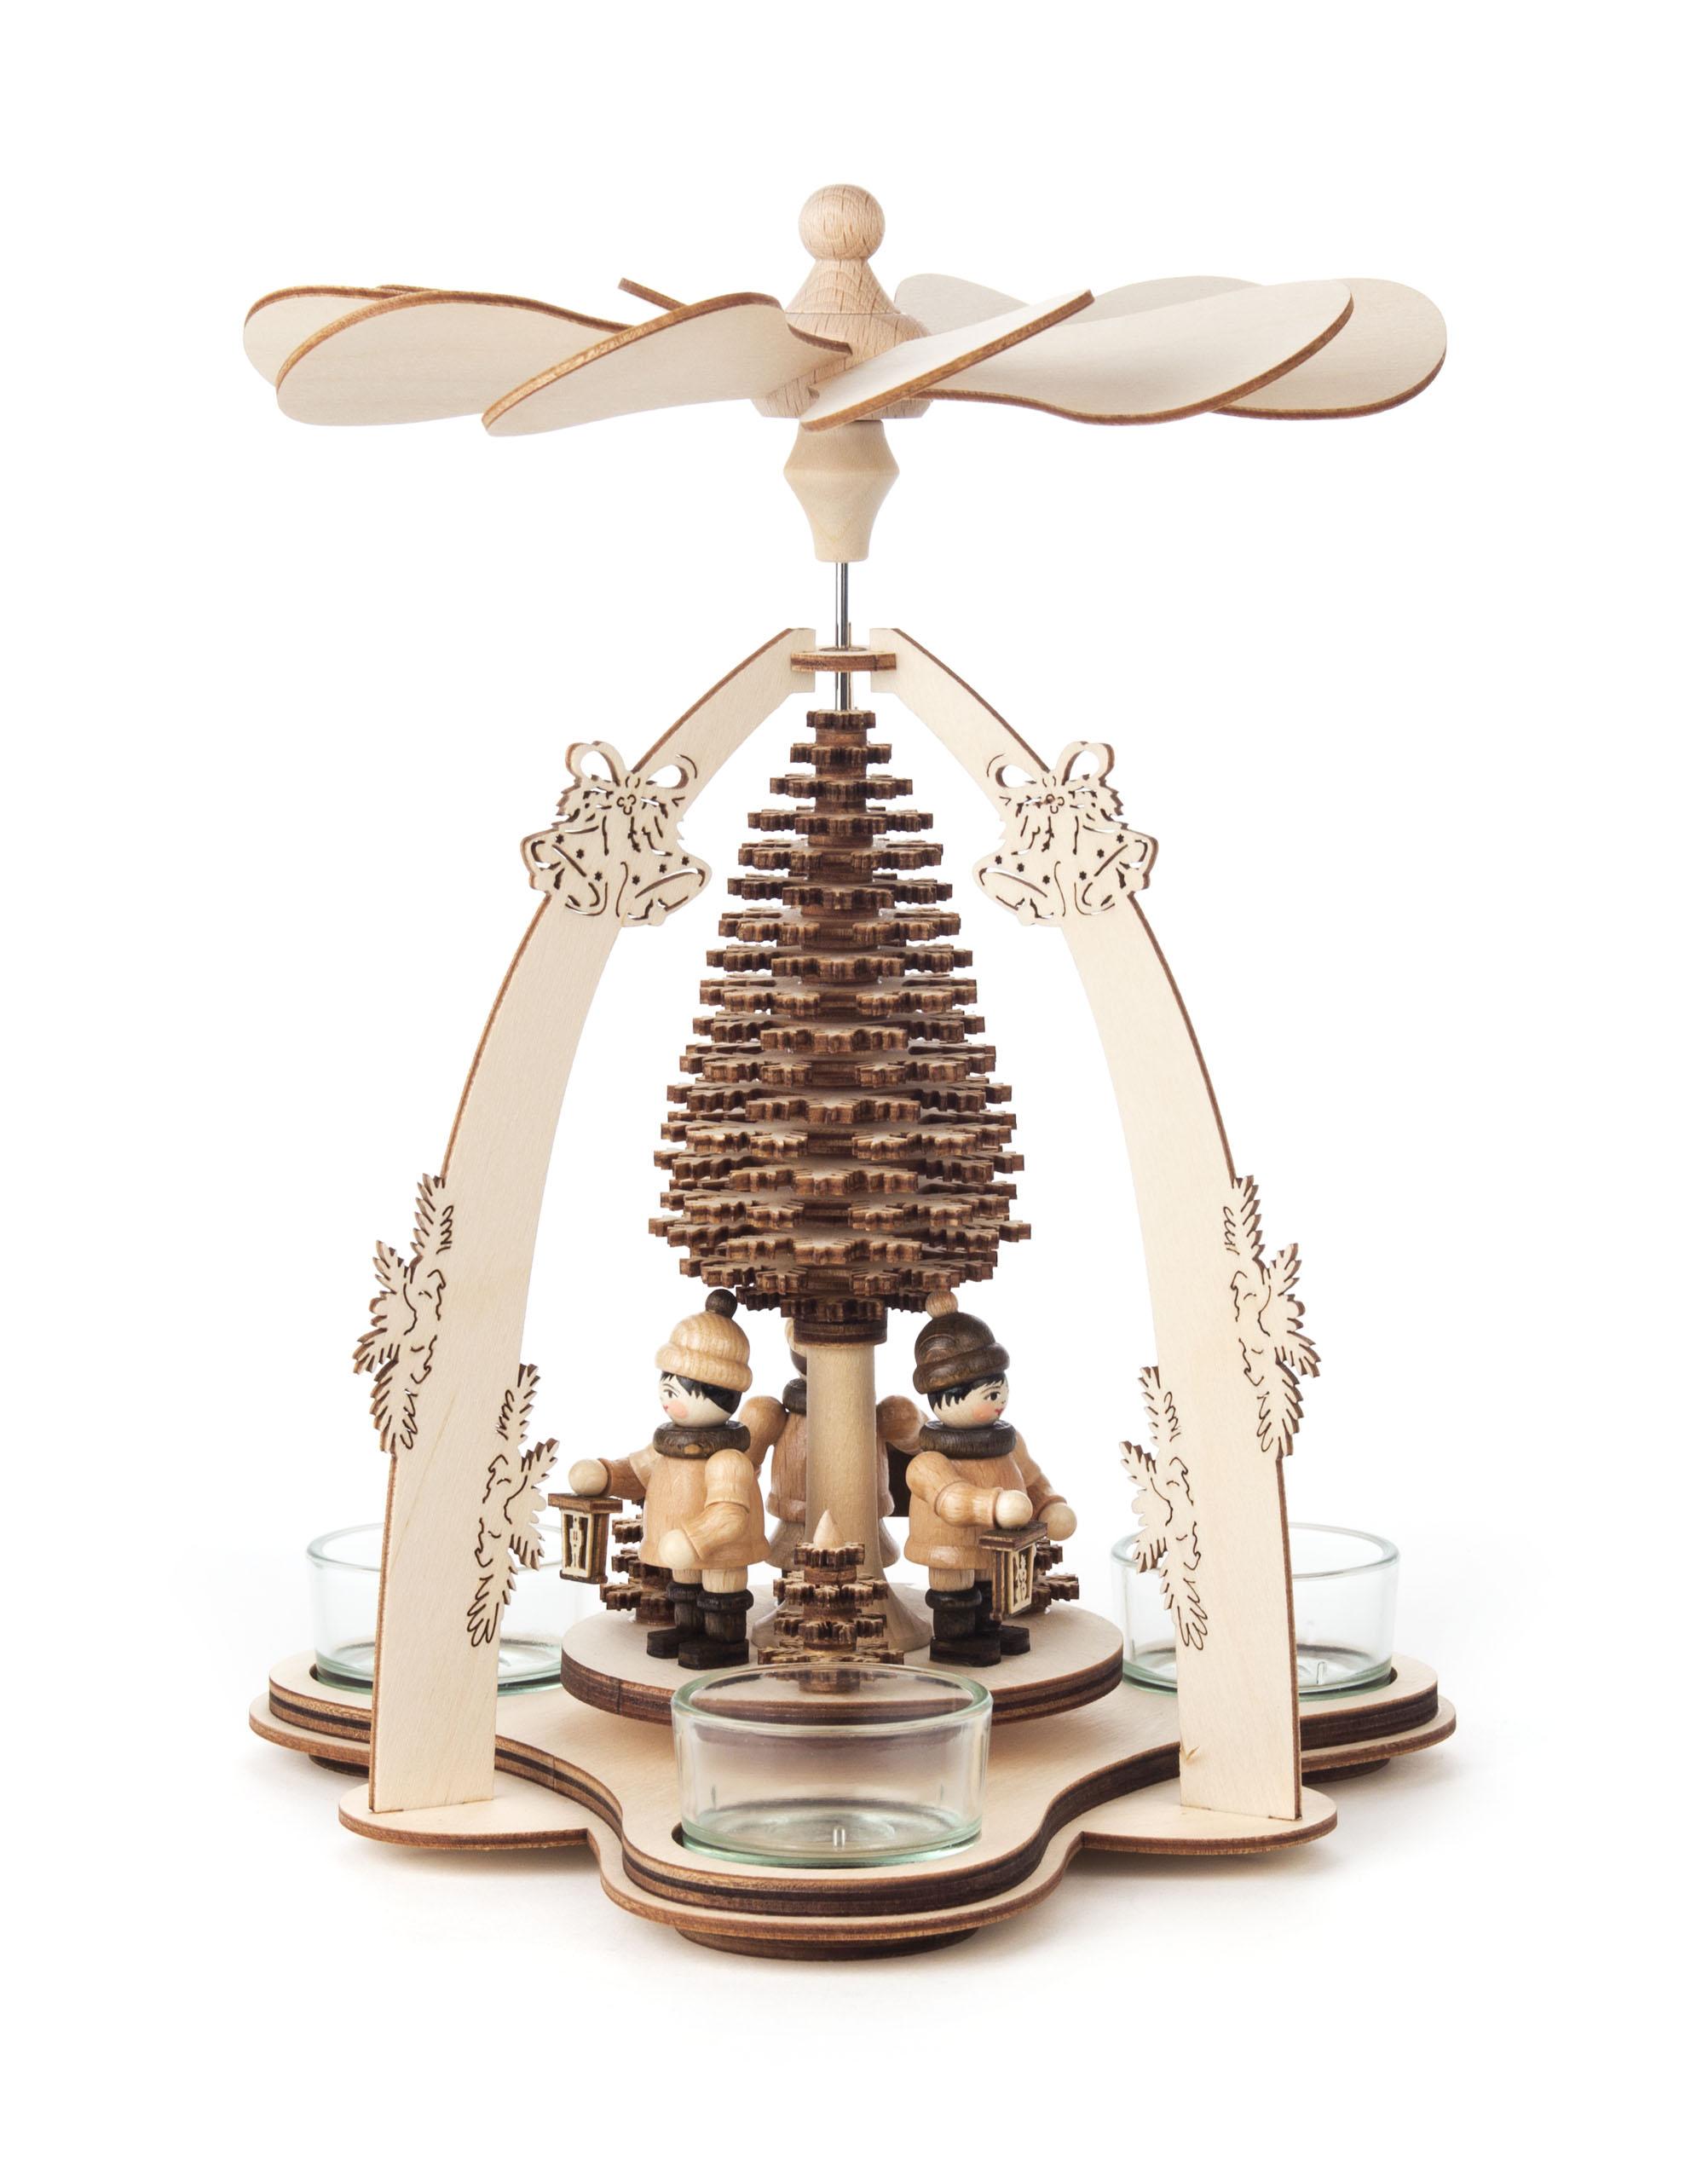 Dregeno Lantern Children, w/Carved Tree, for T-Lights – 9.75″